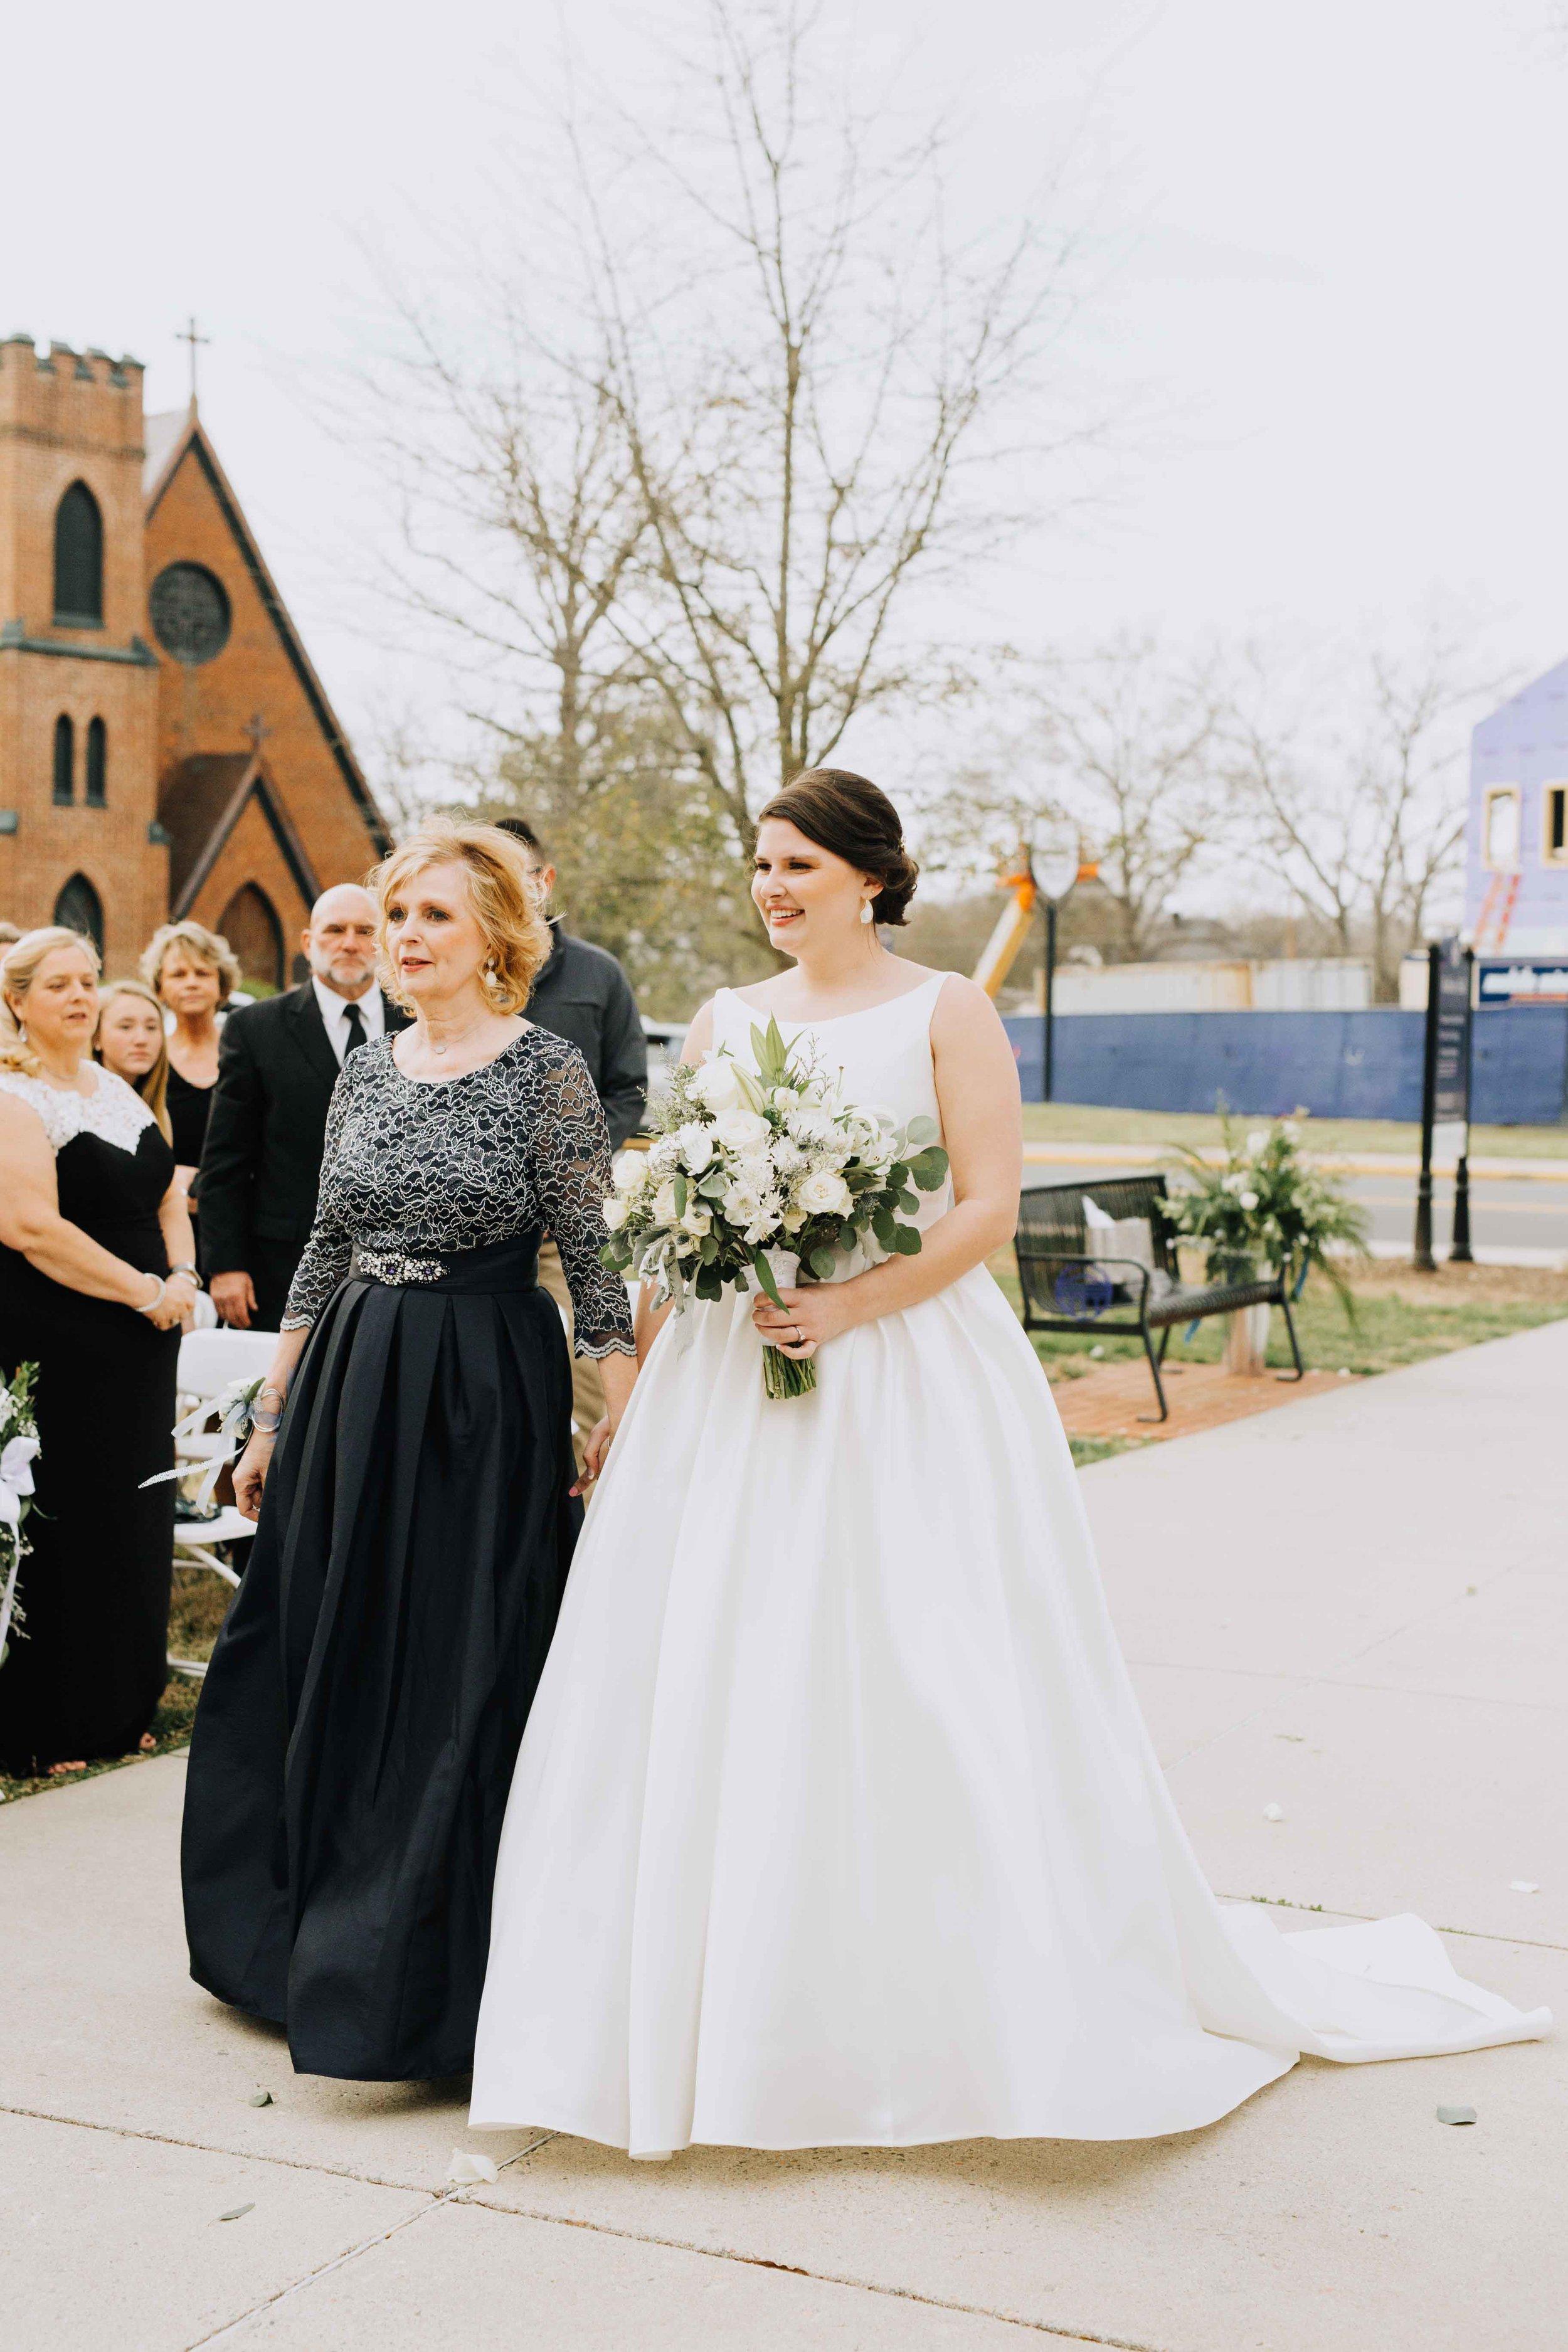 Farmville-Virginia-Wedding-Hotel-Weynoke-Downtown-Jacqueline-Waters-Photography-Detailed- (766).jpg